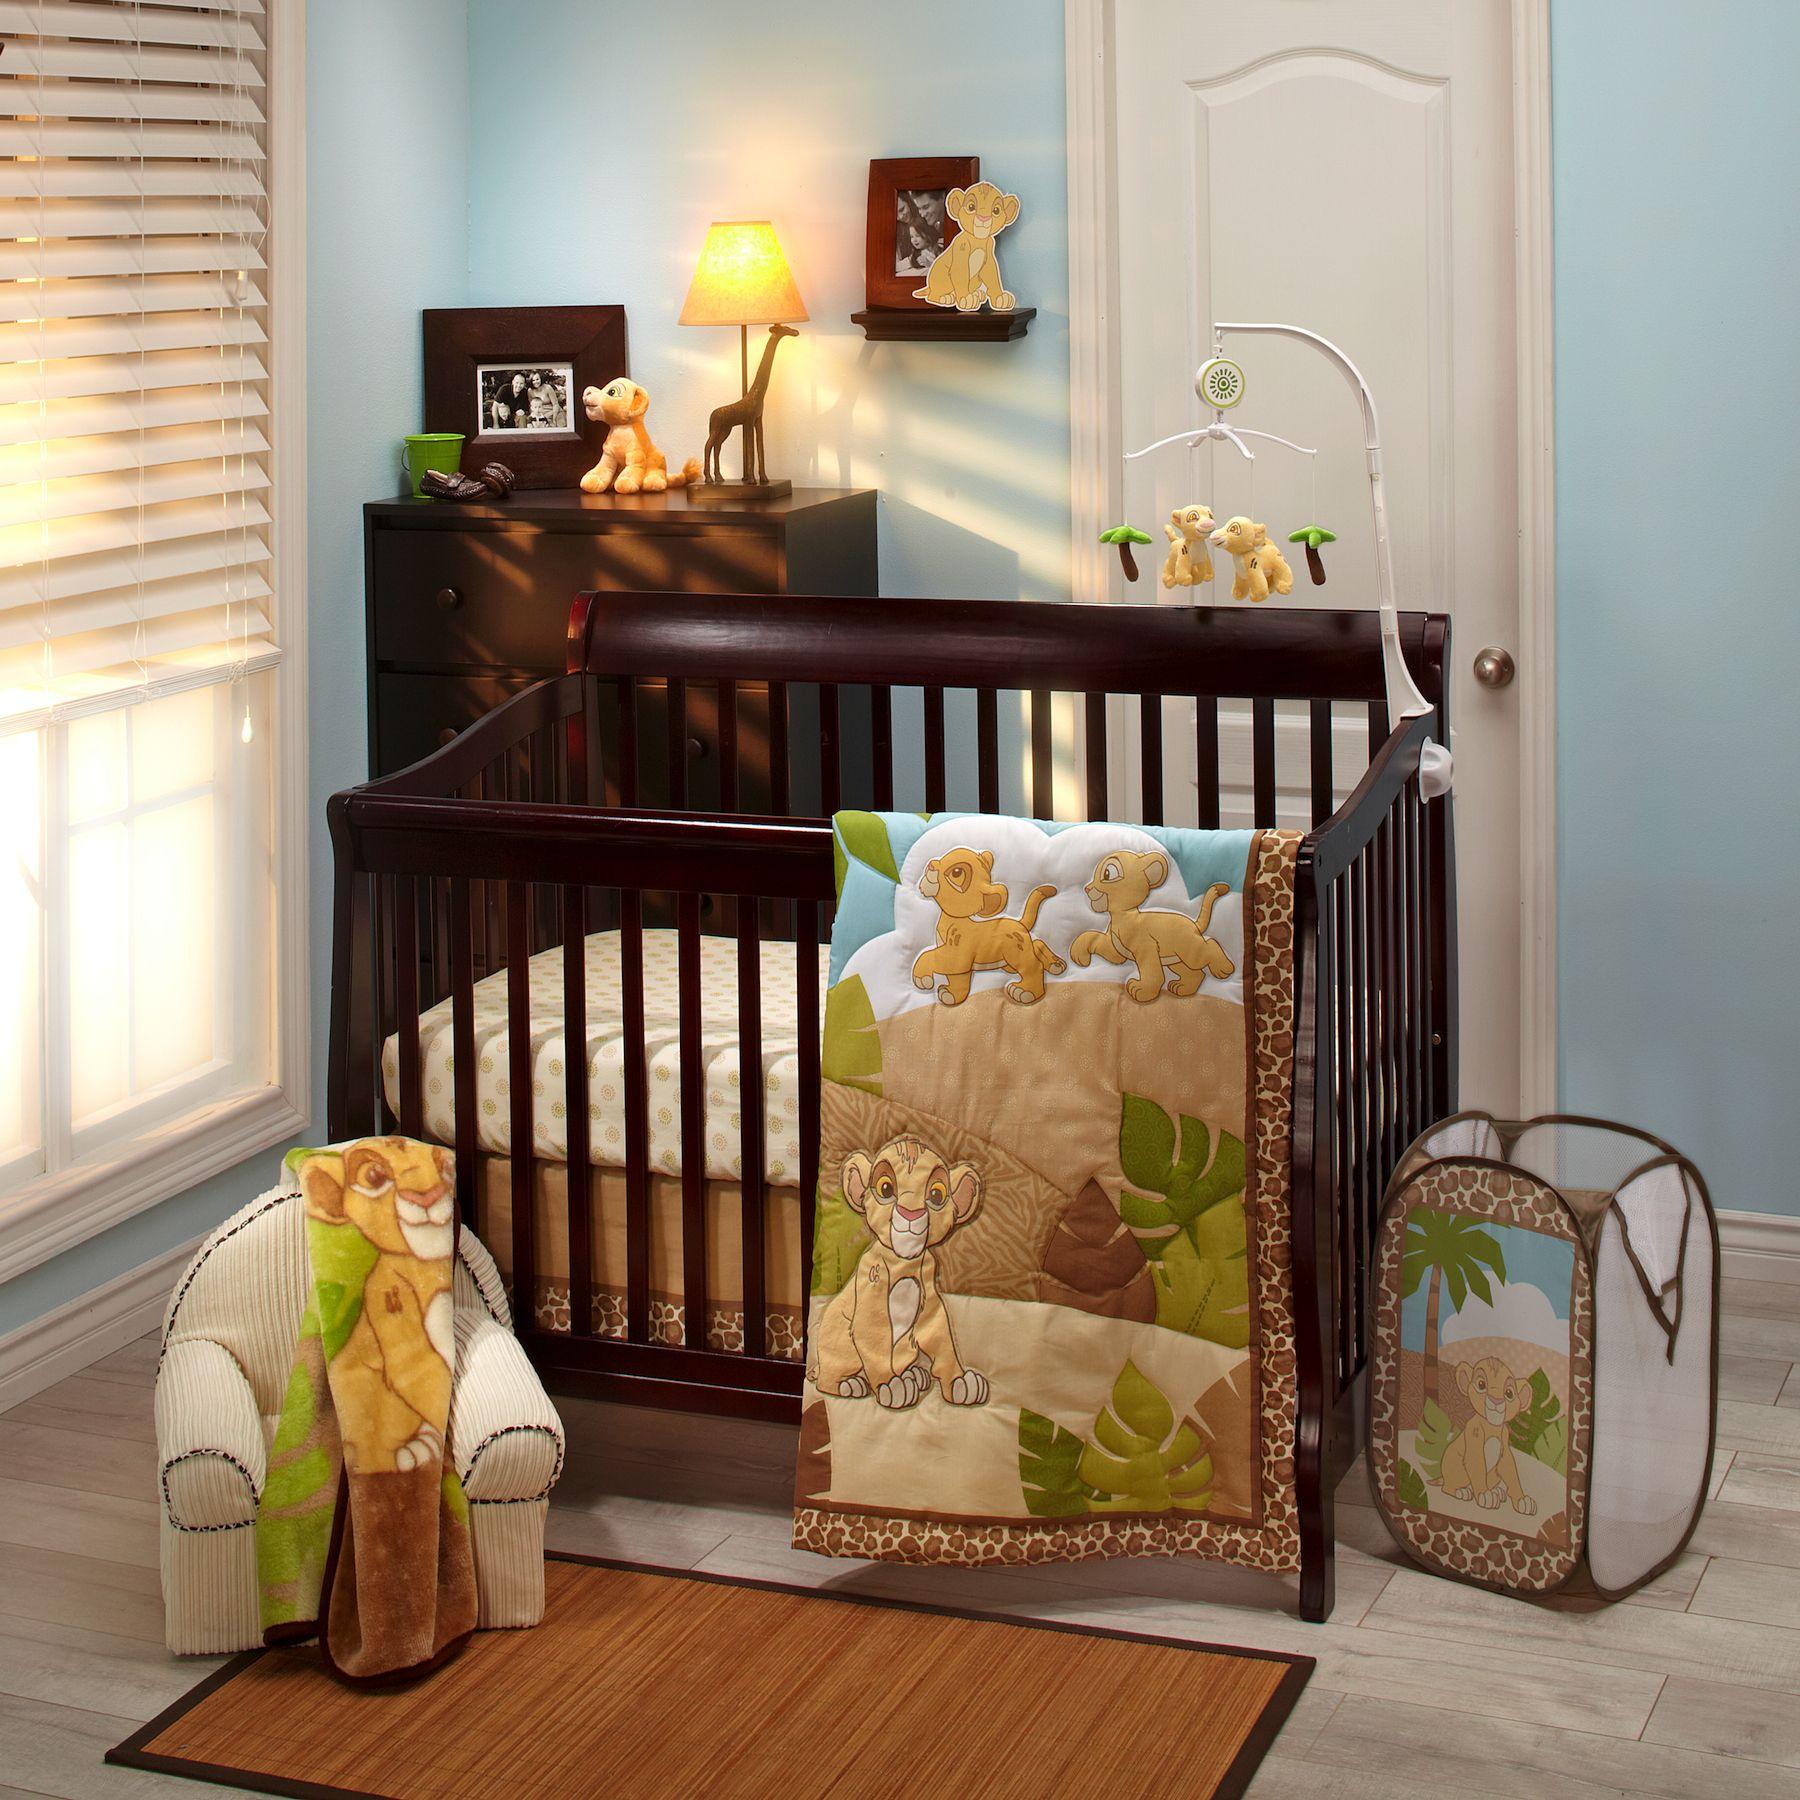 Crib mobile babies r us - Crib Bedding Sets